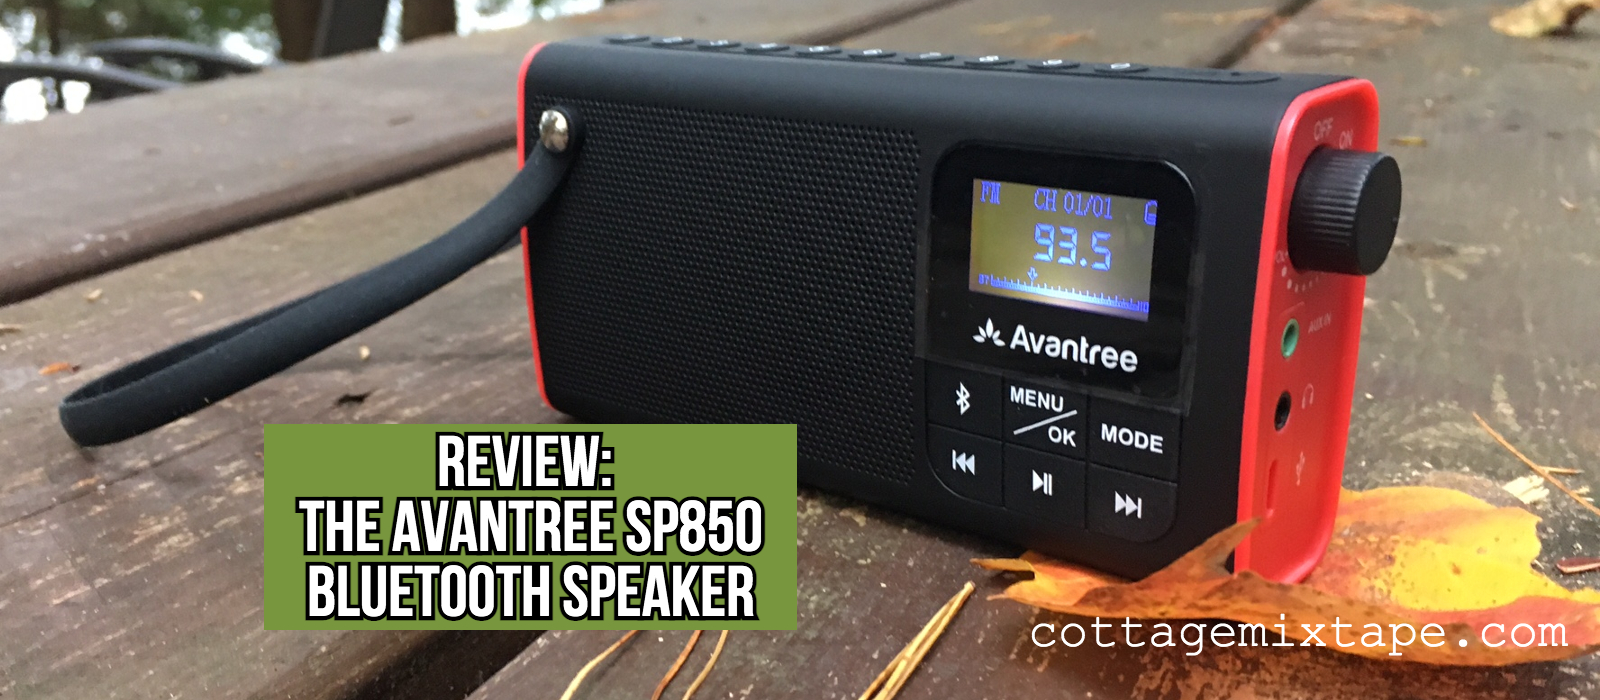 Avantree SP850 Bluetooth Radio Speaker on a outdoor table in radio mode on 93.5